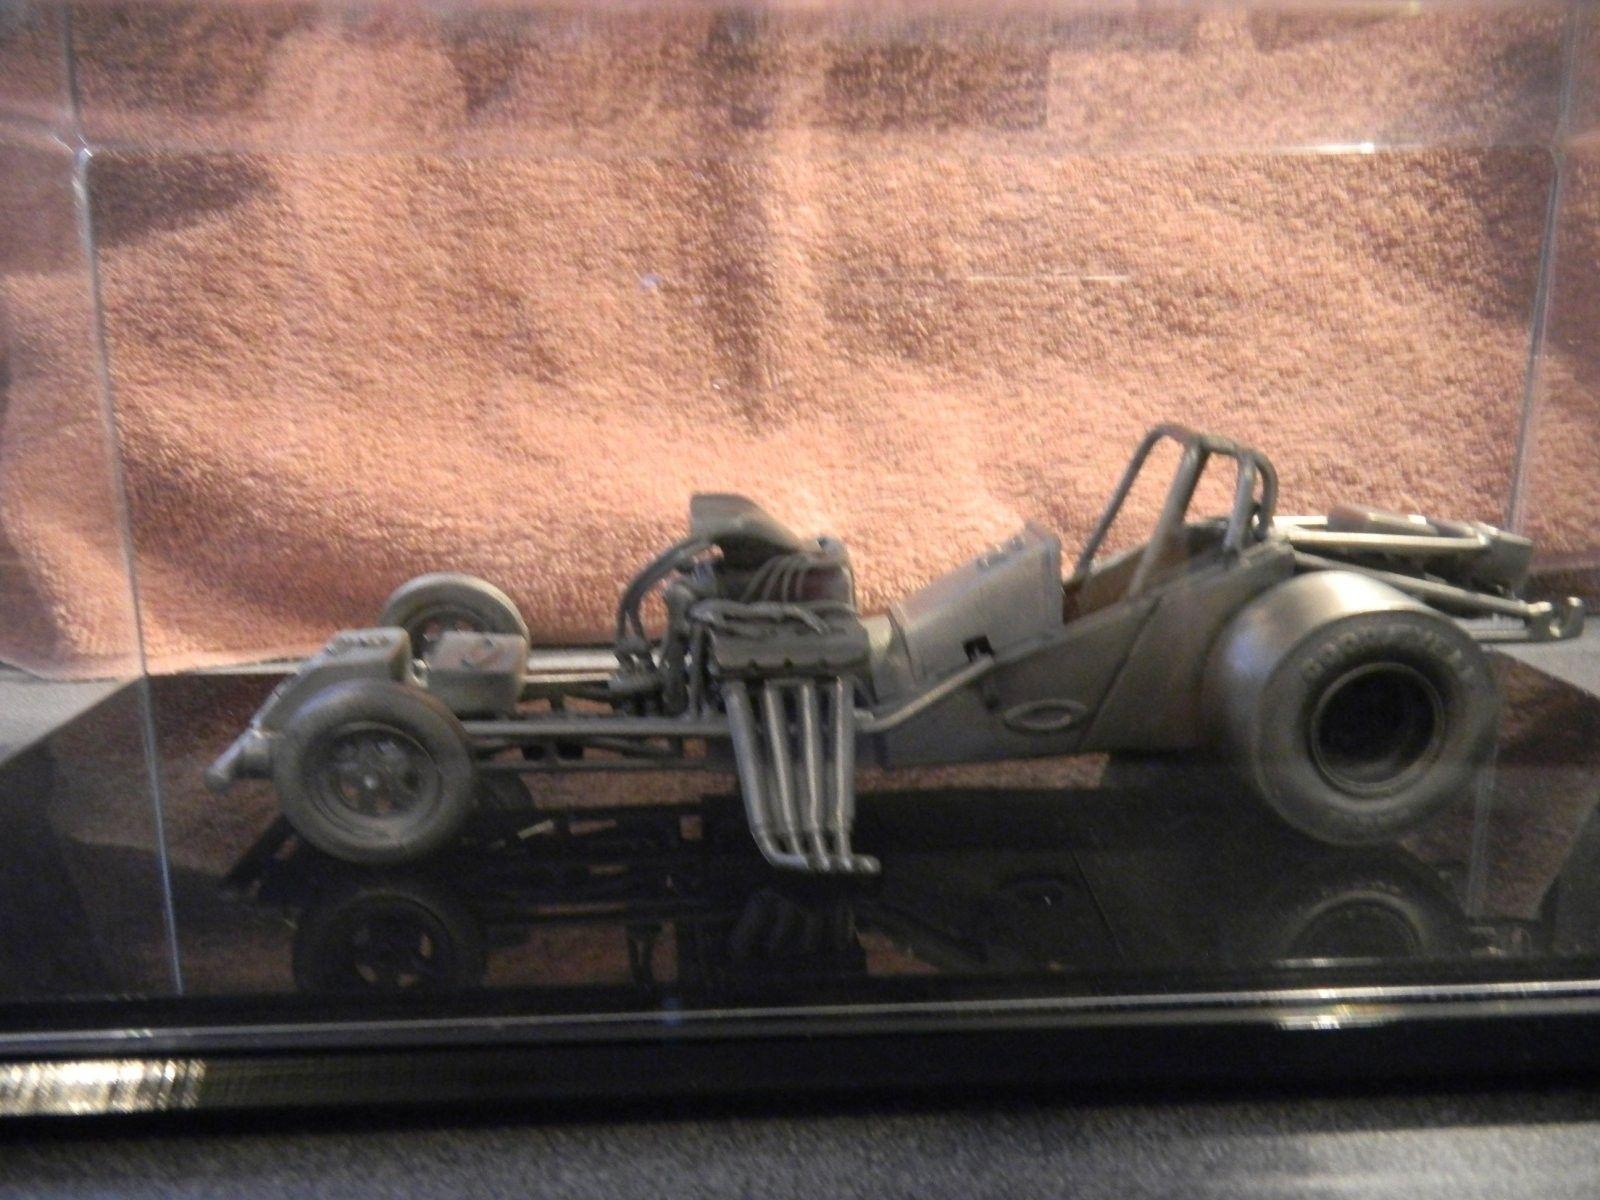 Scotty Cannon PEWTER Funny Car - DSCN1867.JPG